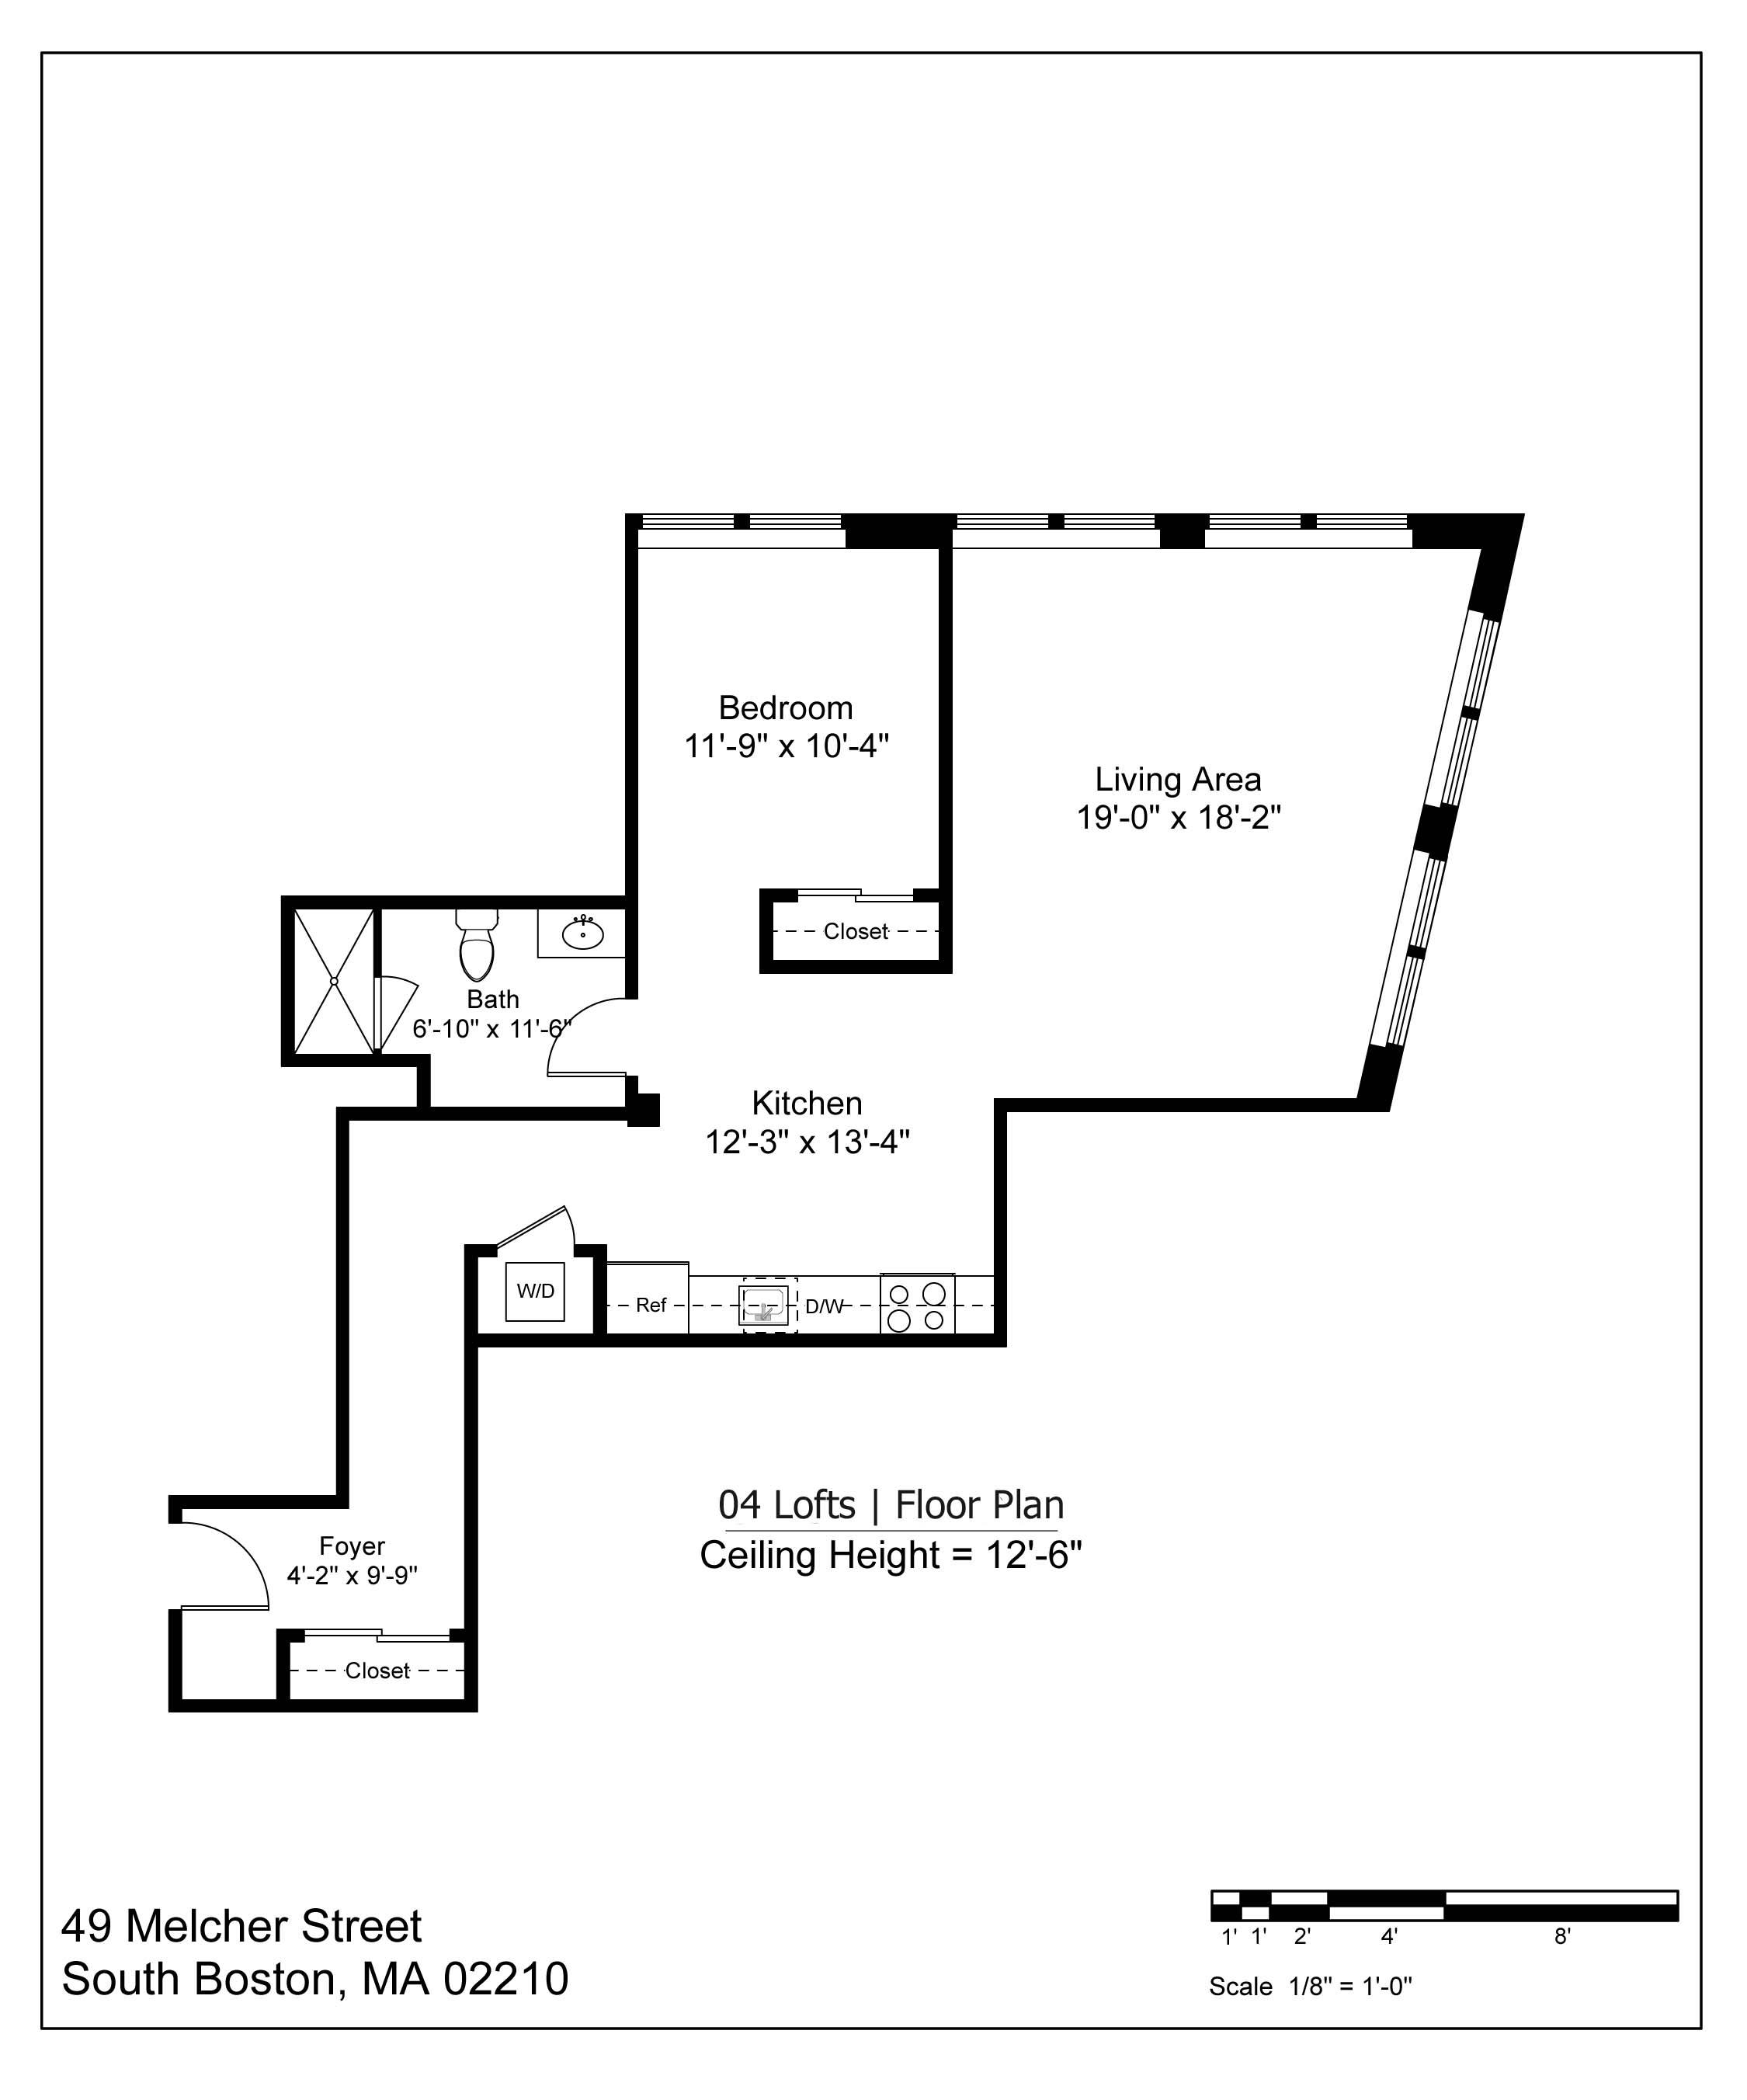 04 LOFT FLOOR PLAN - 897 SF | $3100-3300/MONTH